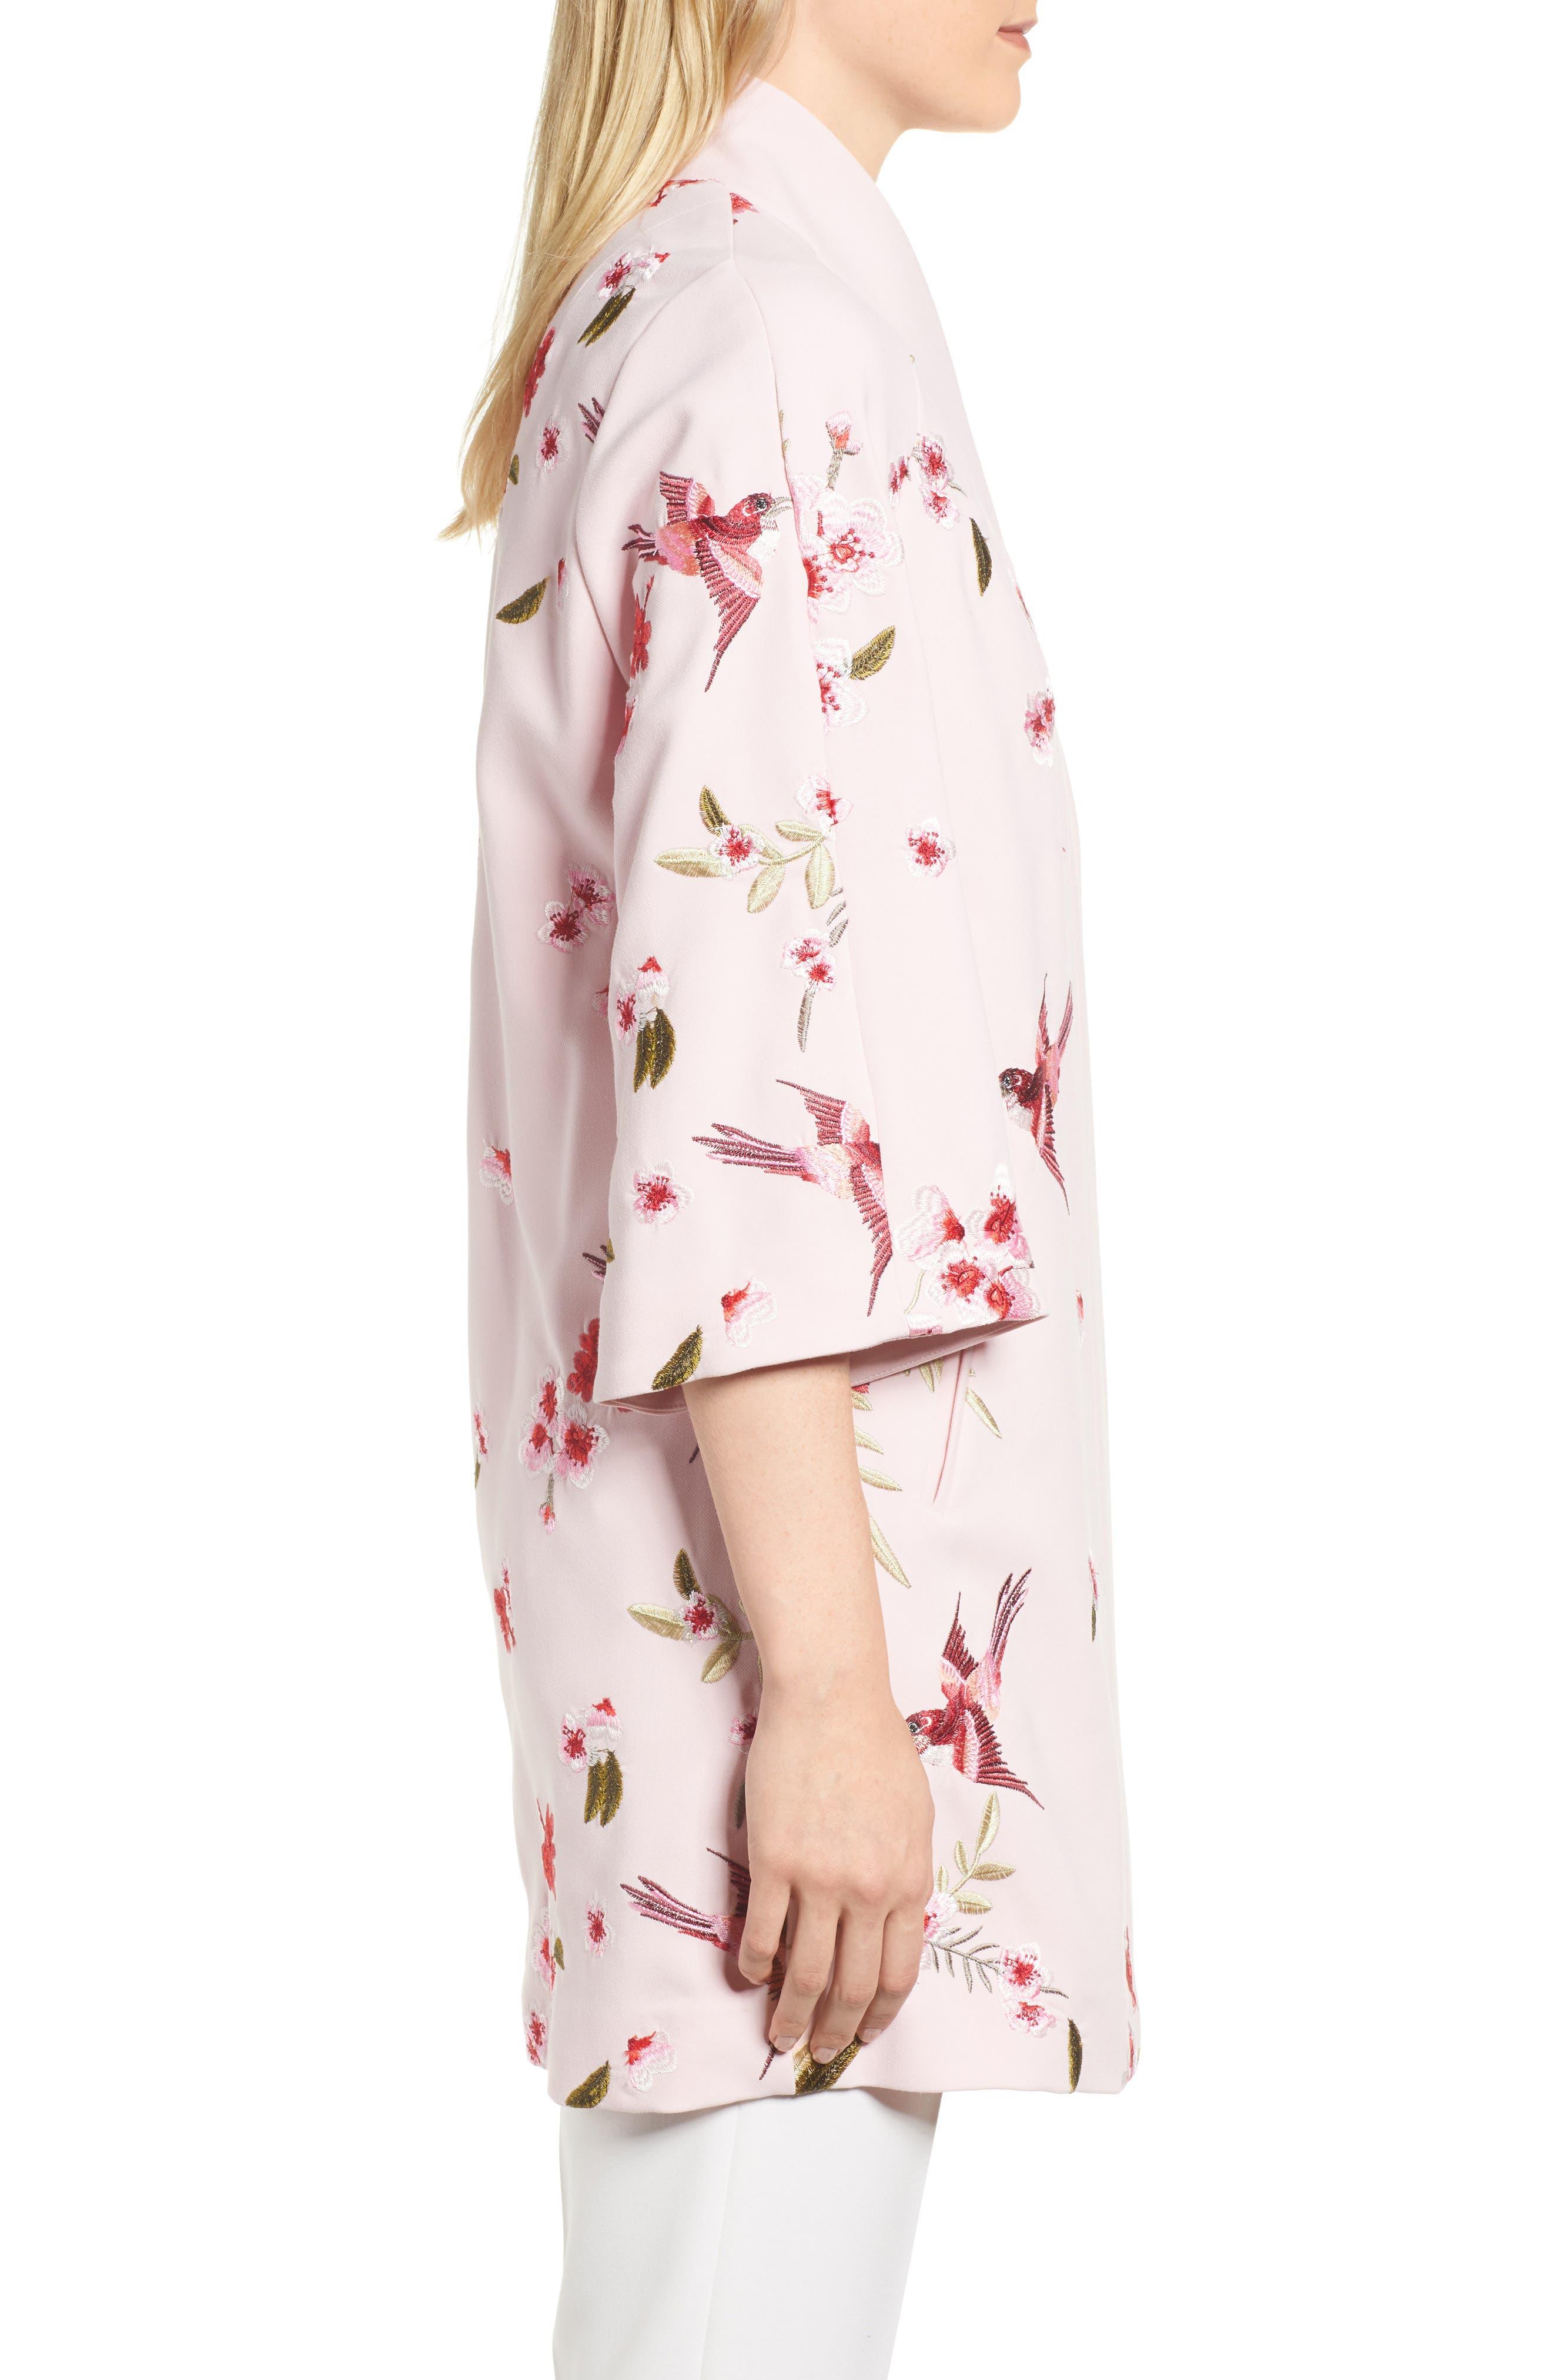 Bird & Blossom Spring Kimono,                             Alternate thumbnail 3, color,                             Baby Pink